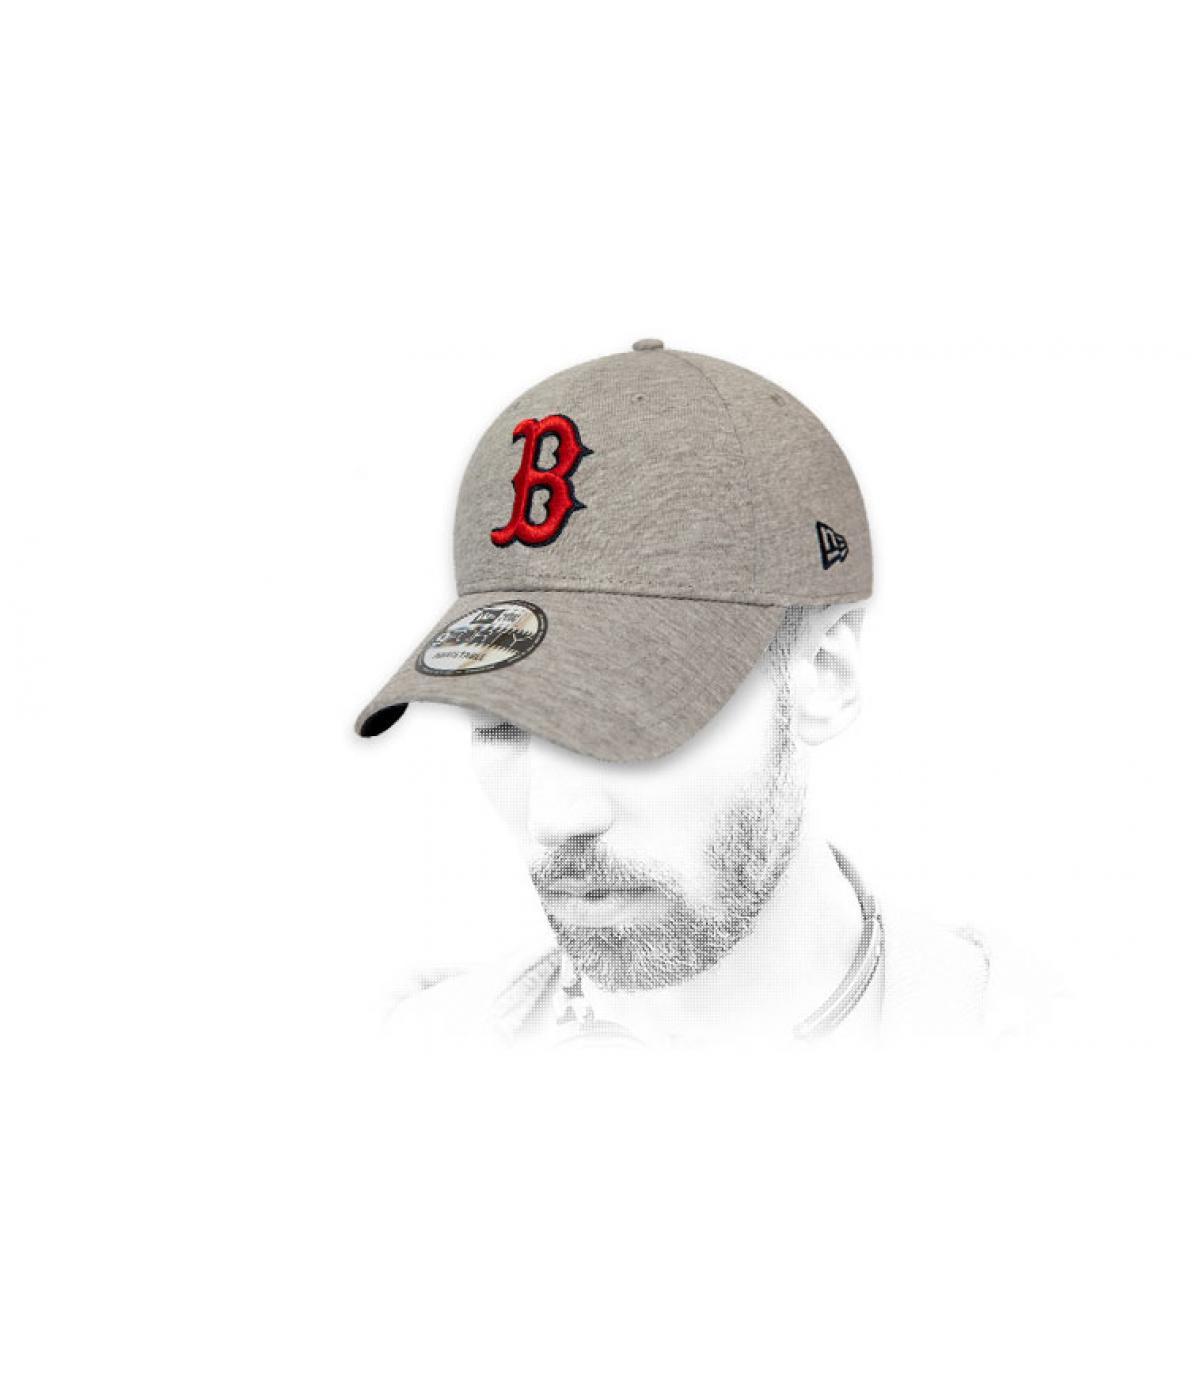 Cap B grau rot